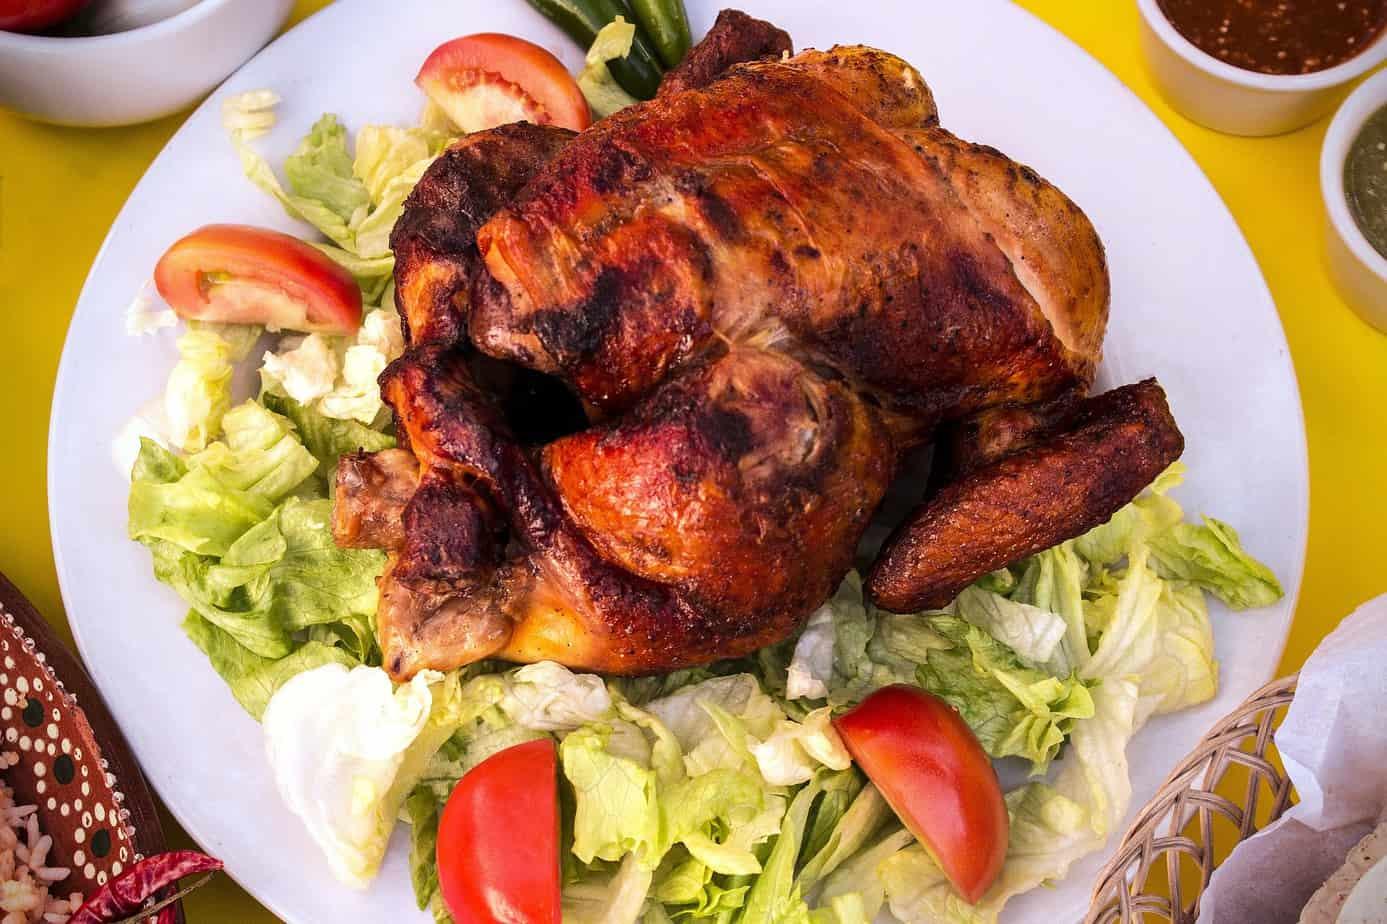 Leftover chicken